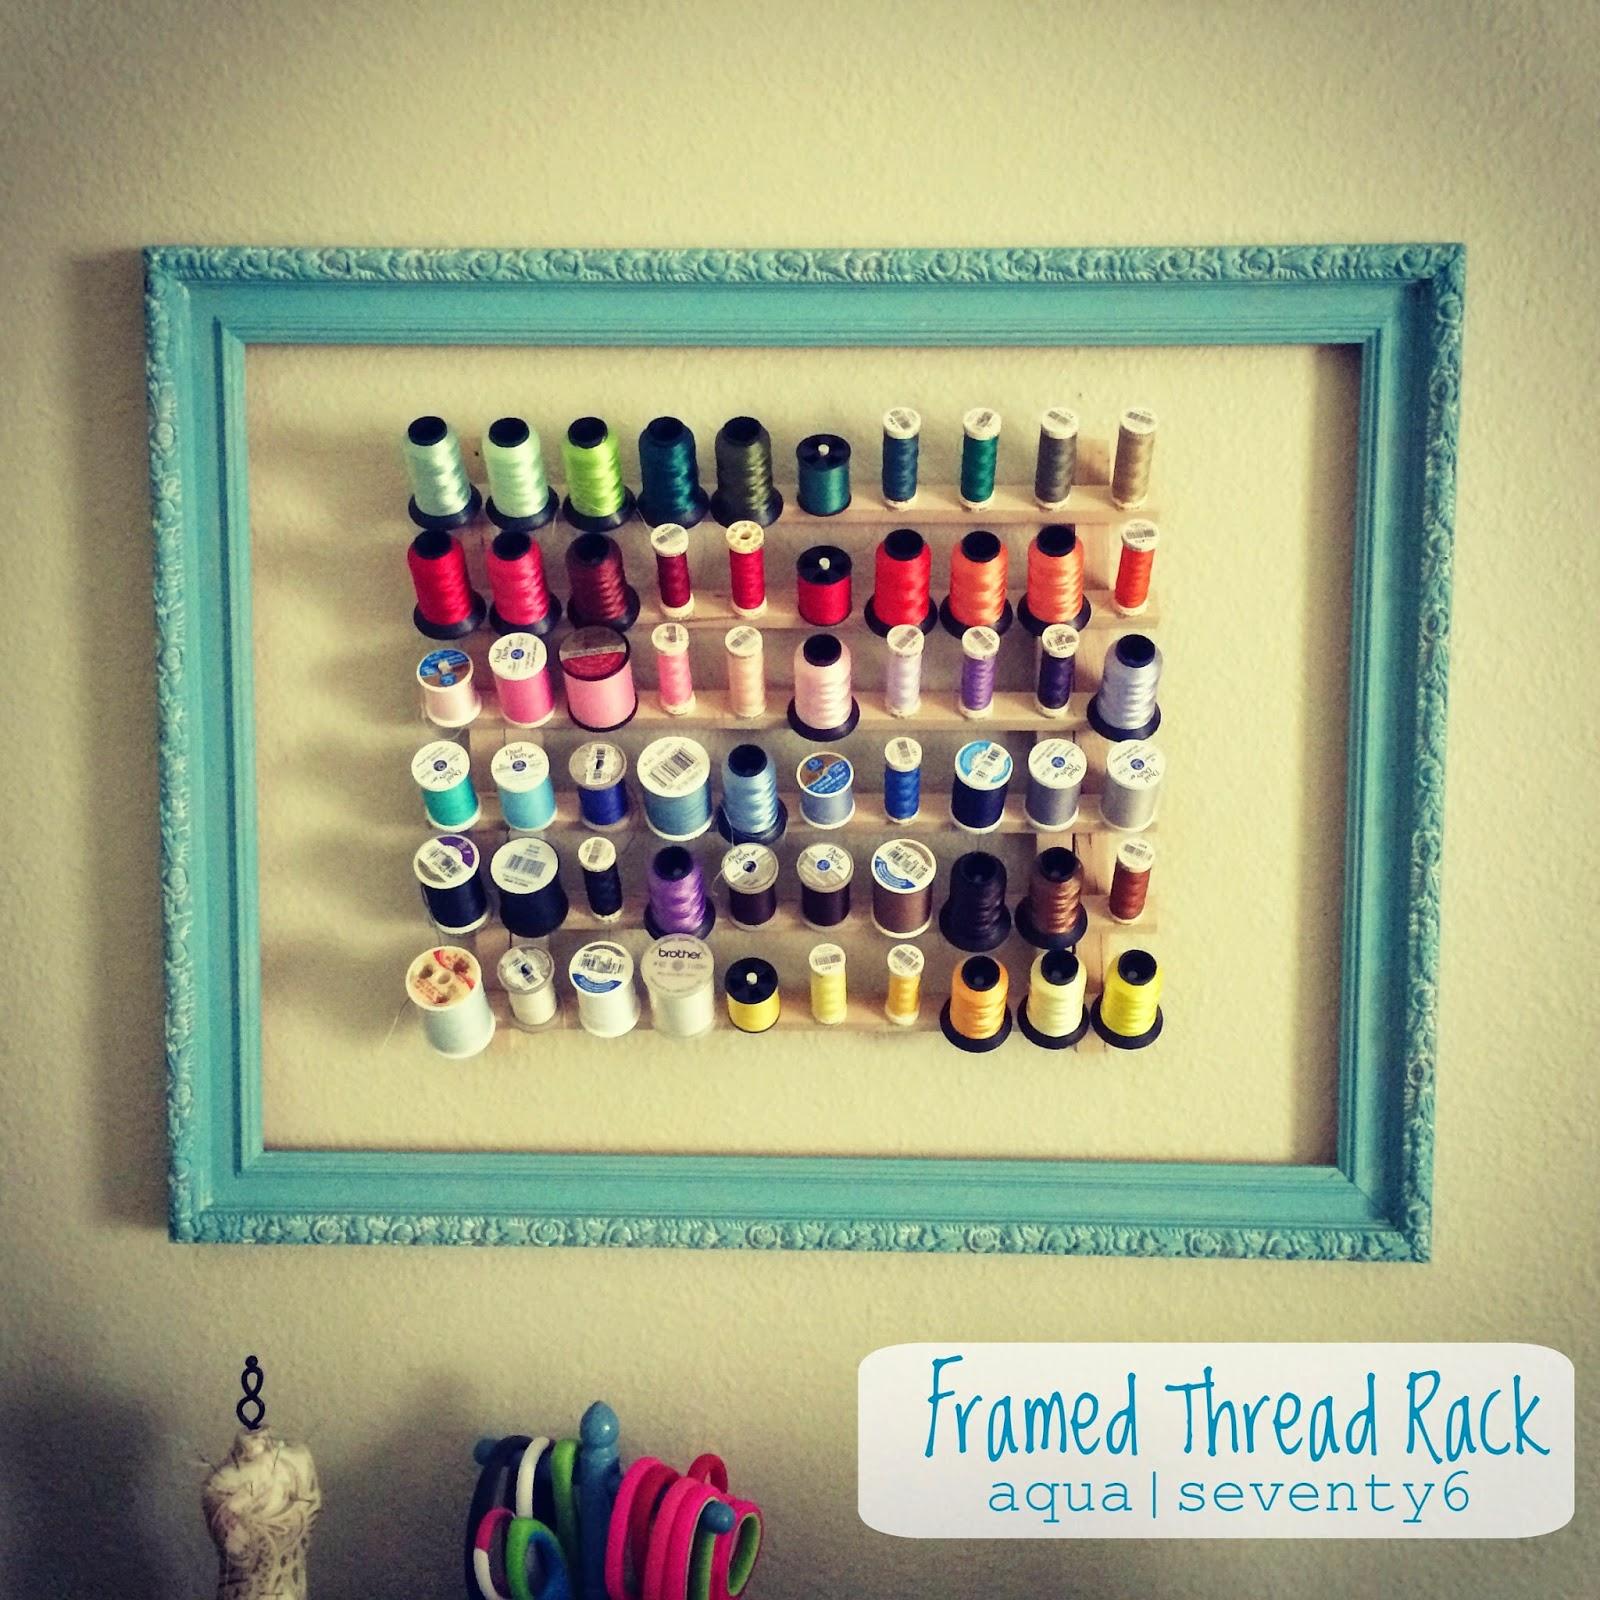 Clipboard Wall Art and Framed Thread Rack